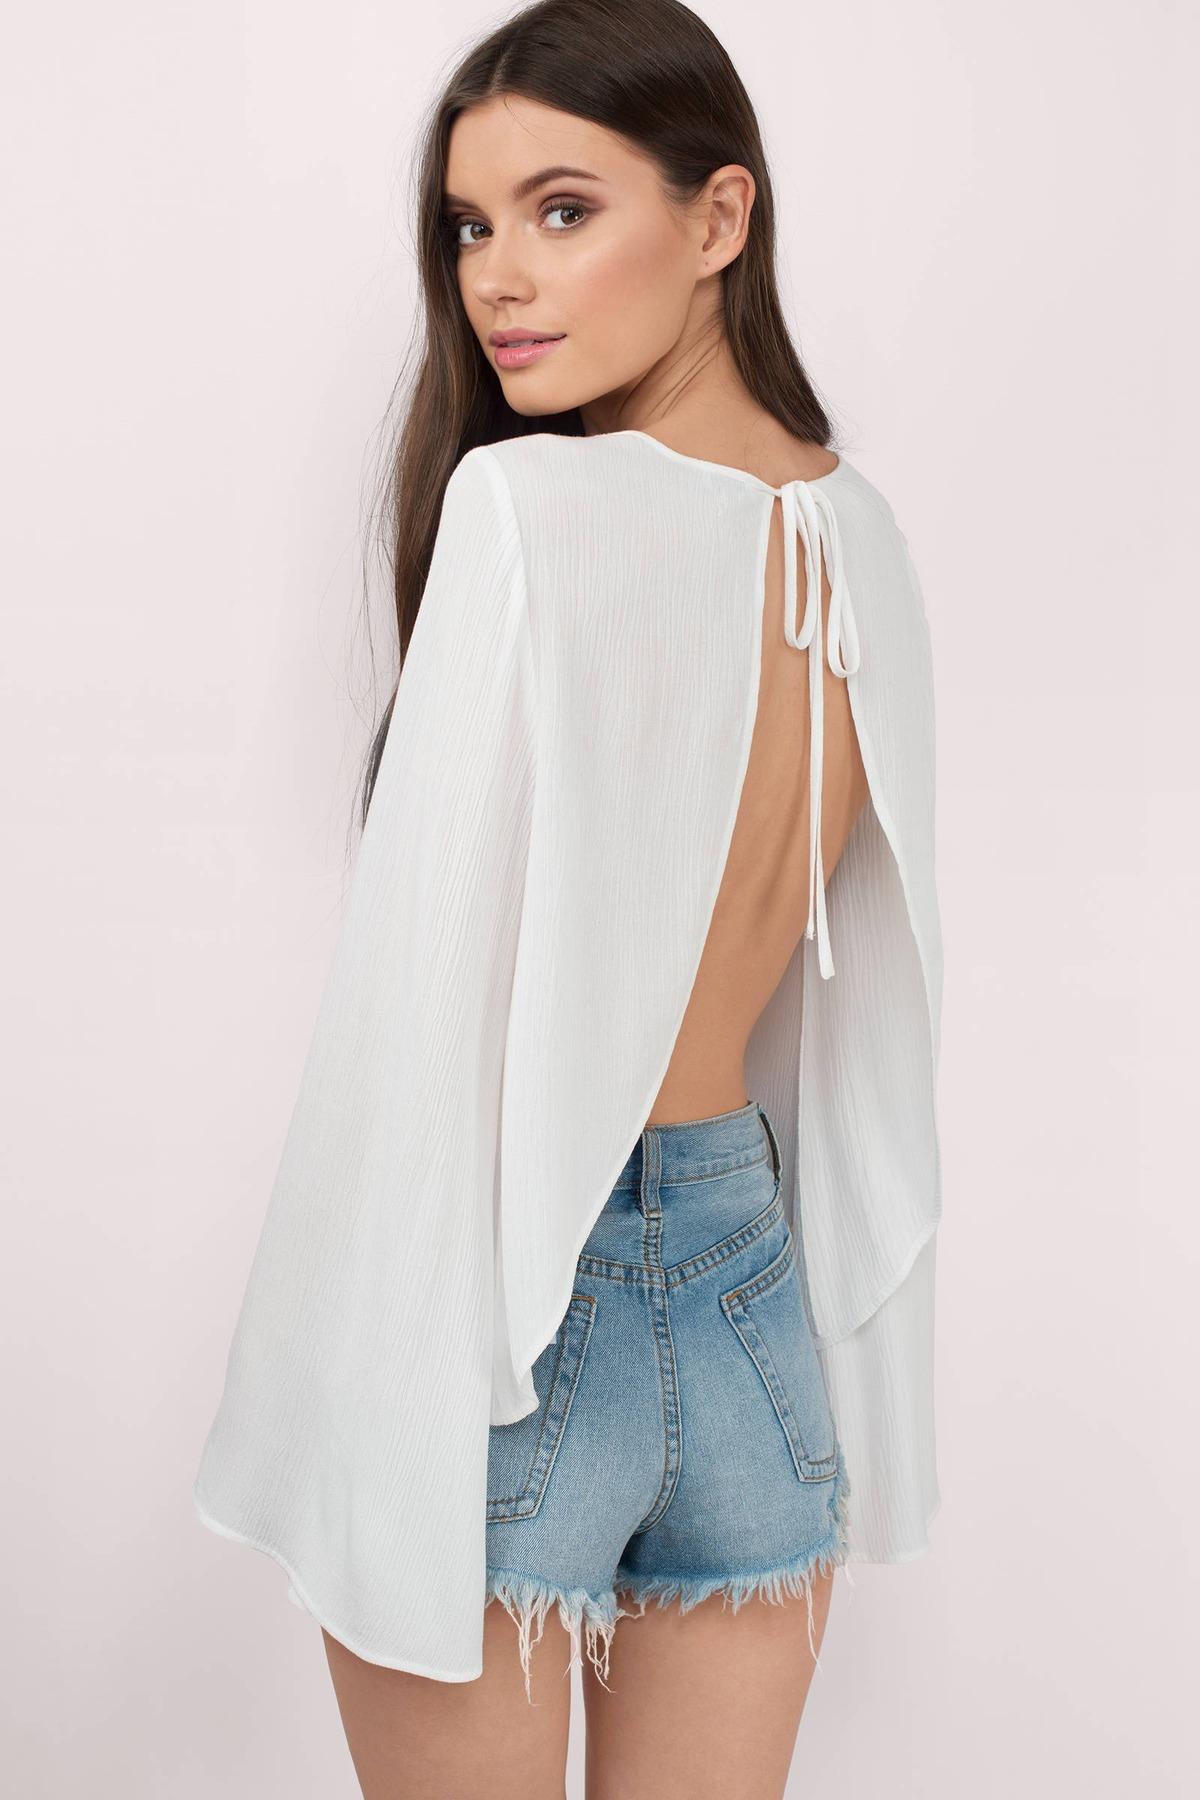 Cute White Blouse - Open Back Blouse - White Blouse - $48.00